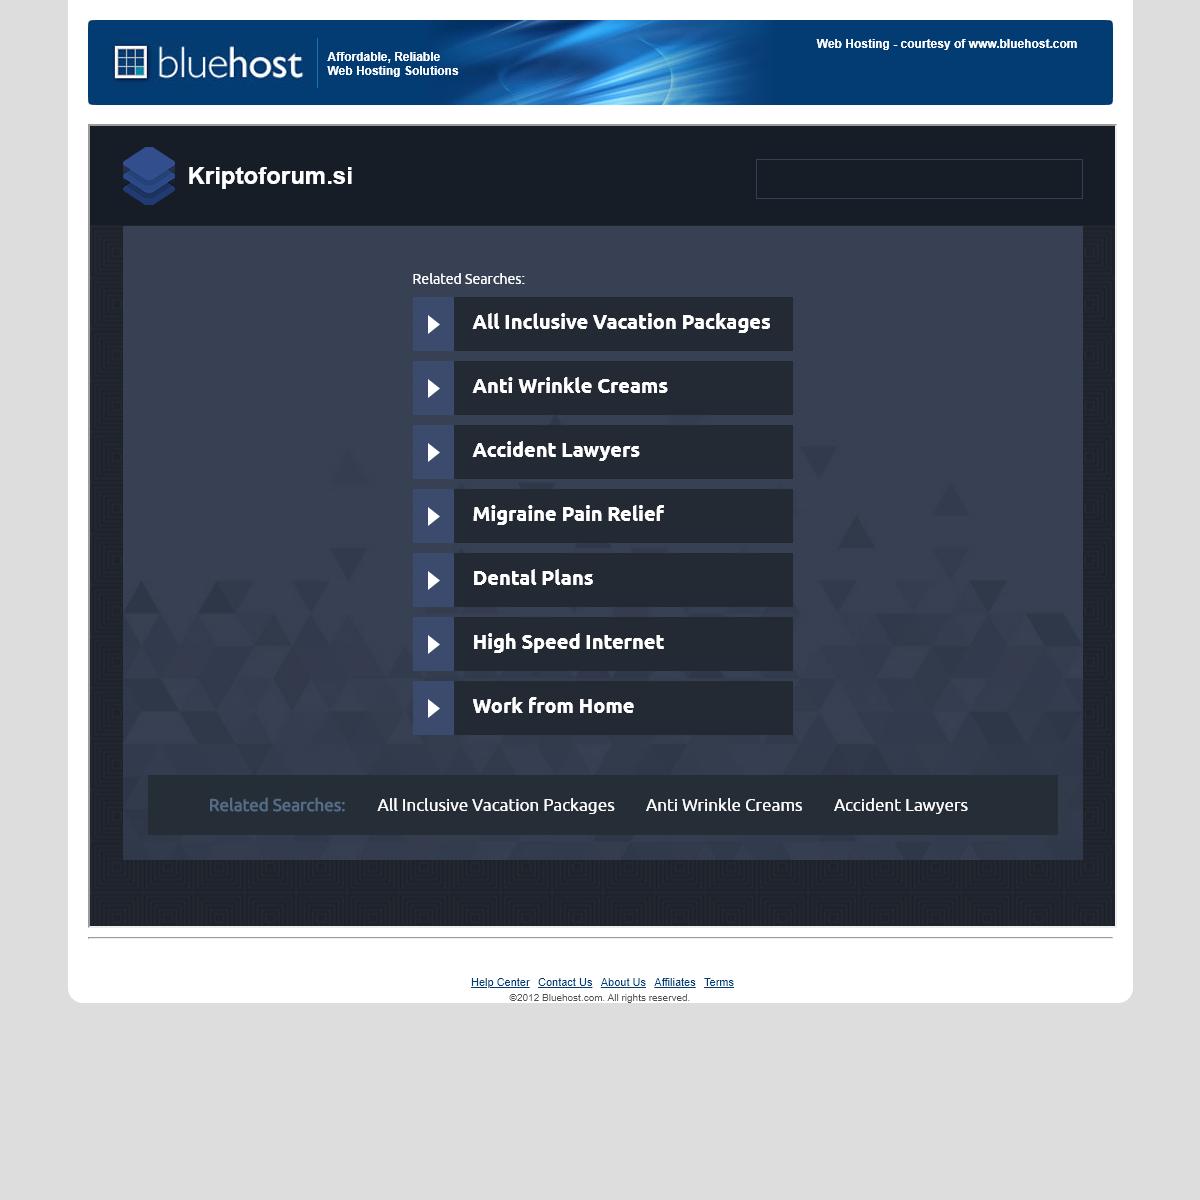 Welcome kriptoforum.si - BlueHost.com